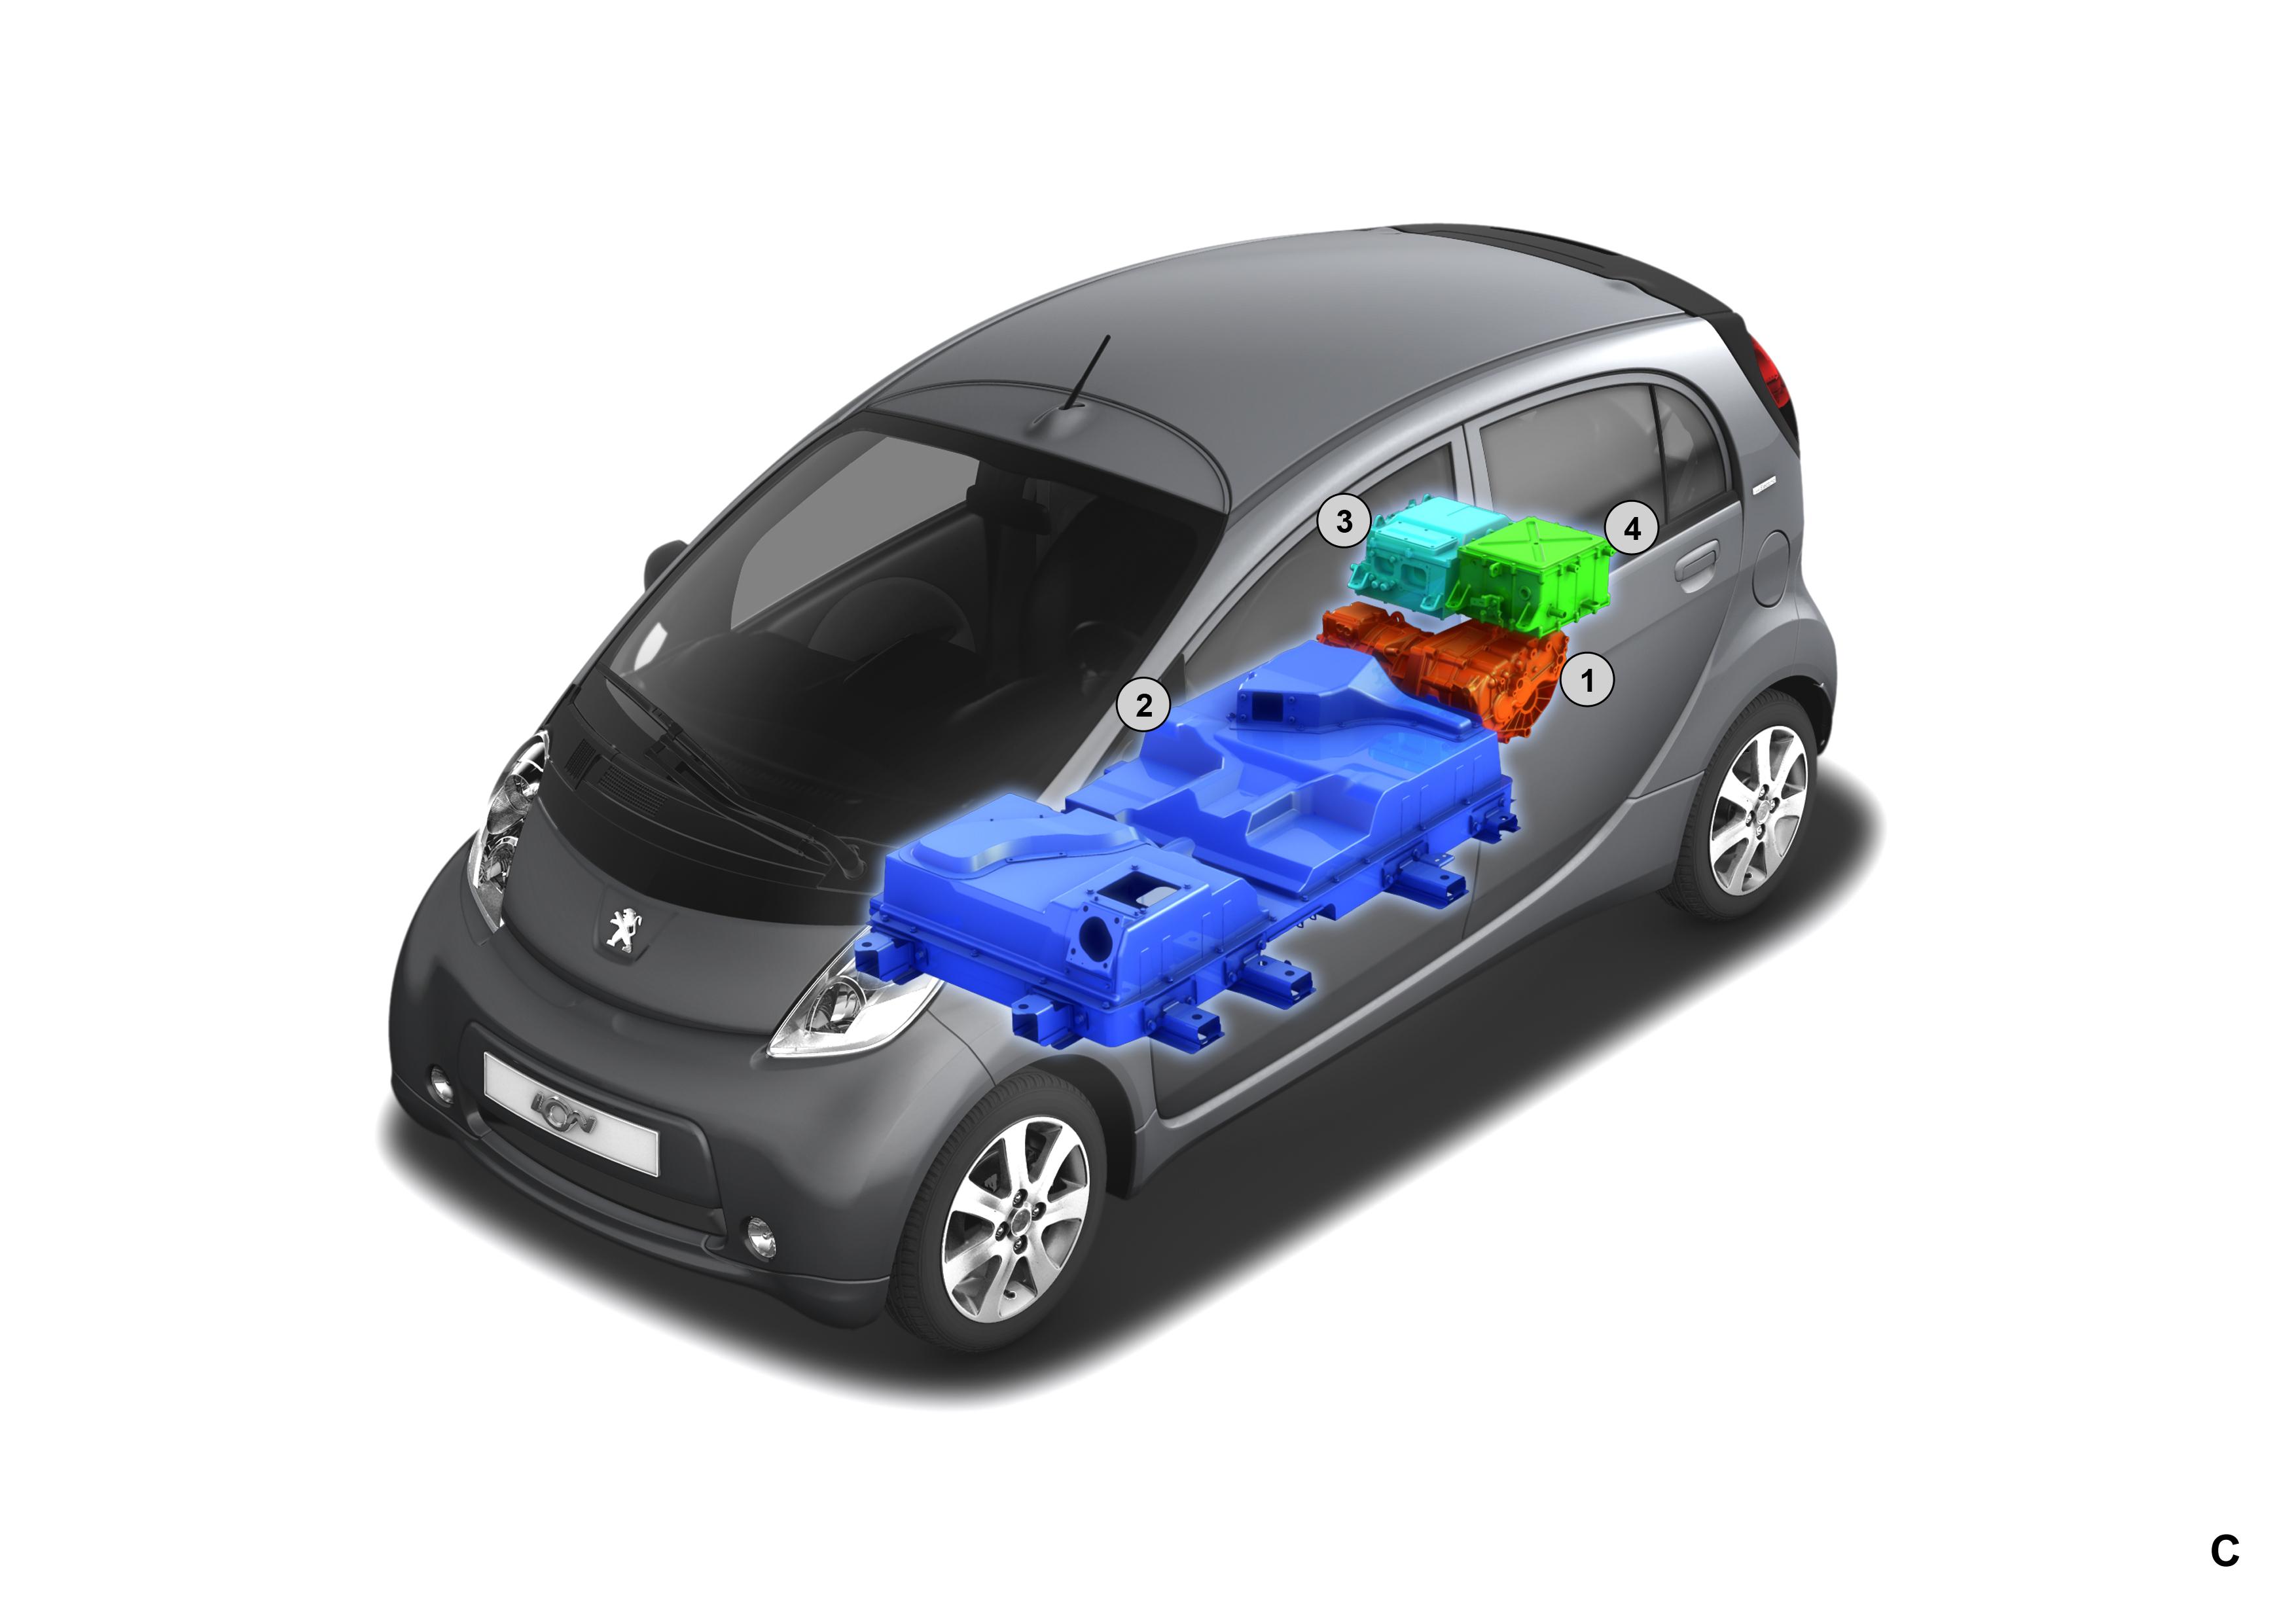 Schema Elettrico Motore Trifase : Peugeot ion ludego